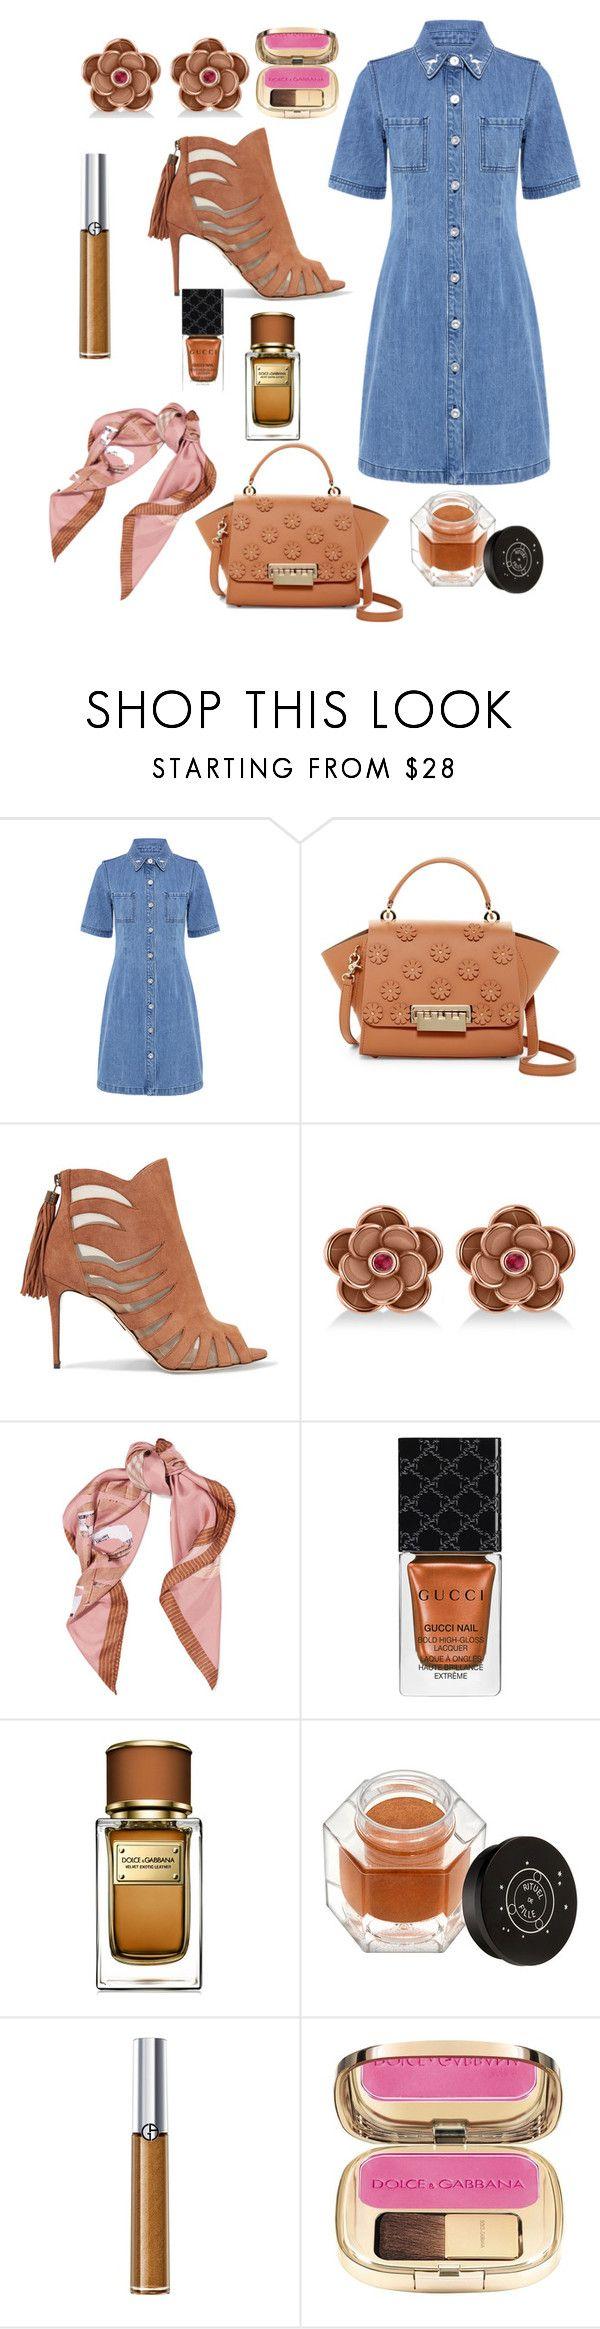 """Jean dress"" by blumbeeno ❤ liked on Polyvore featuring Être Cécile, ZAC Zac Posen, Paul Andrew, Allurez, Moschino, Gucci, Dolce&Gabbana, Rituel de Fille and Giorgio Armani"